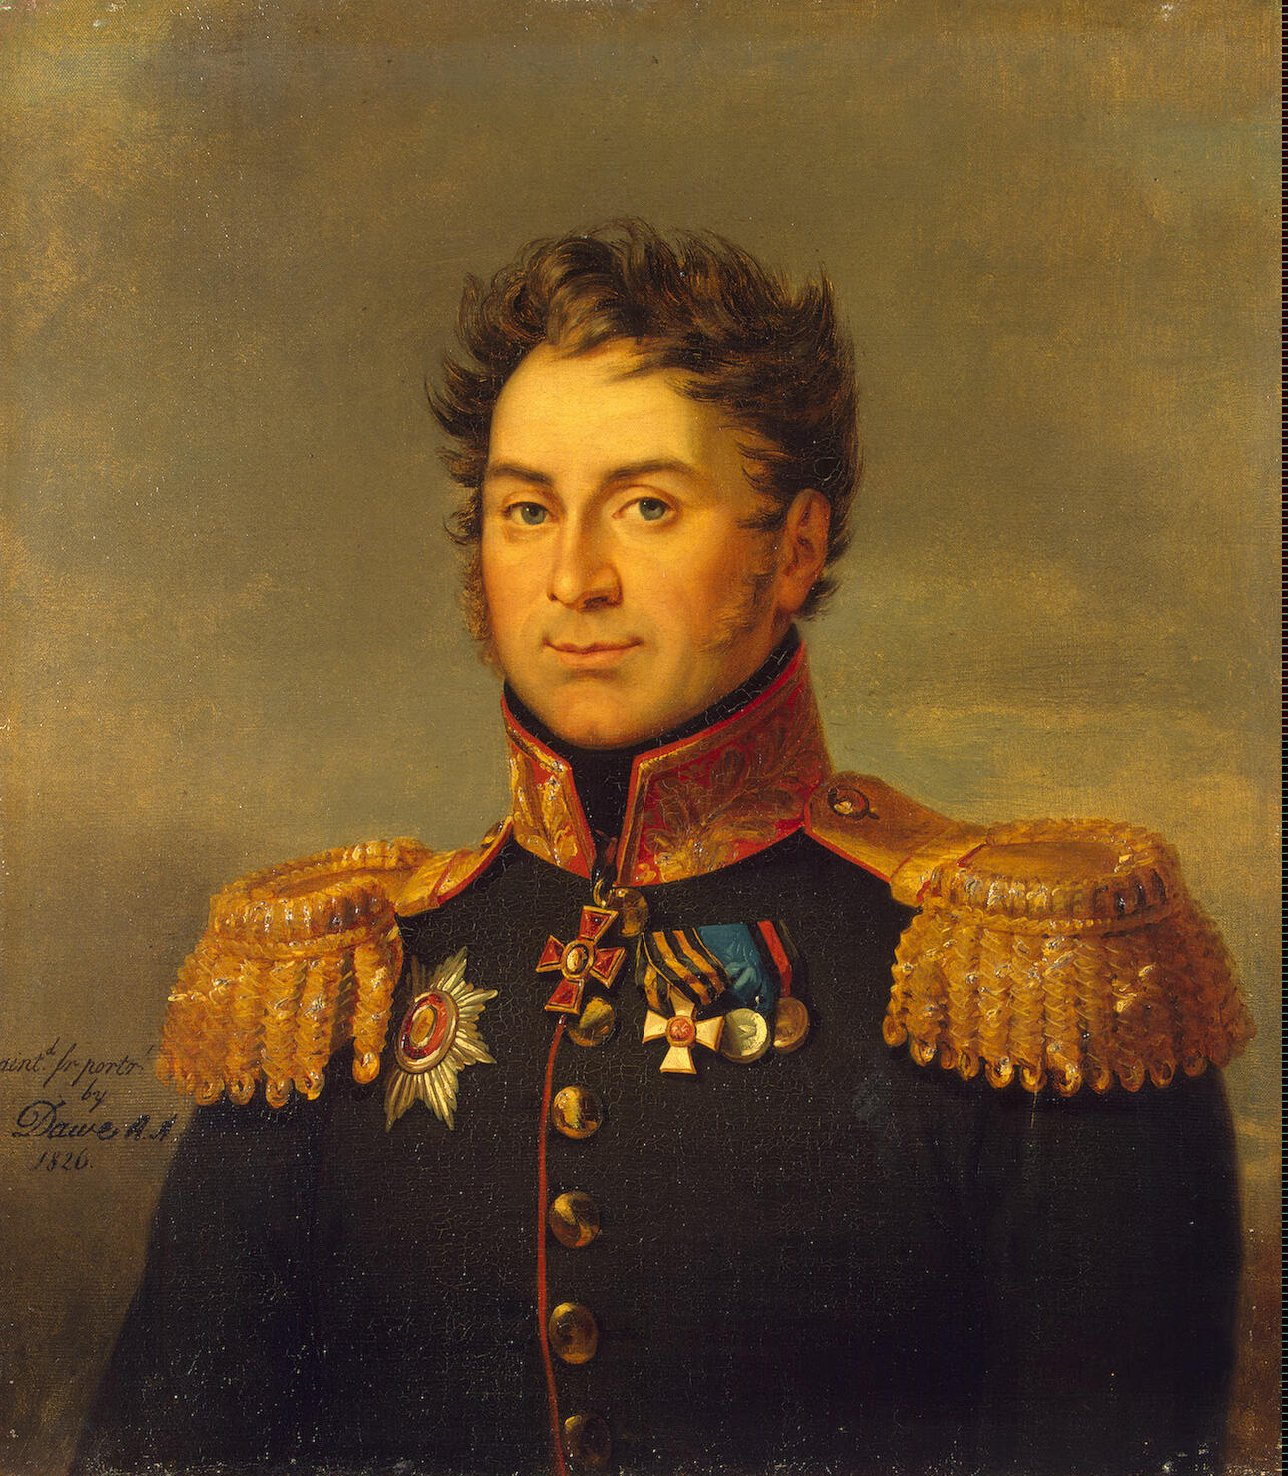 Олсуфьев, Николай Дмитриевич